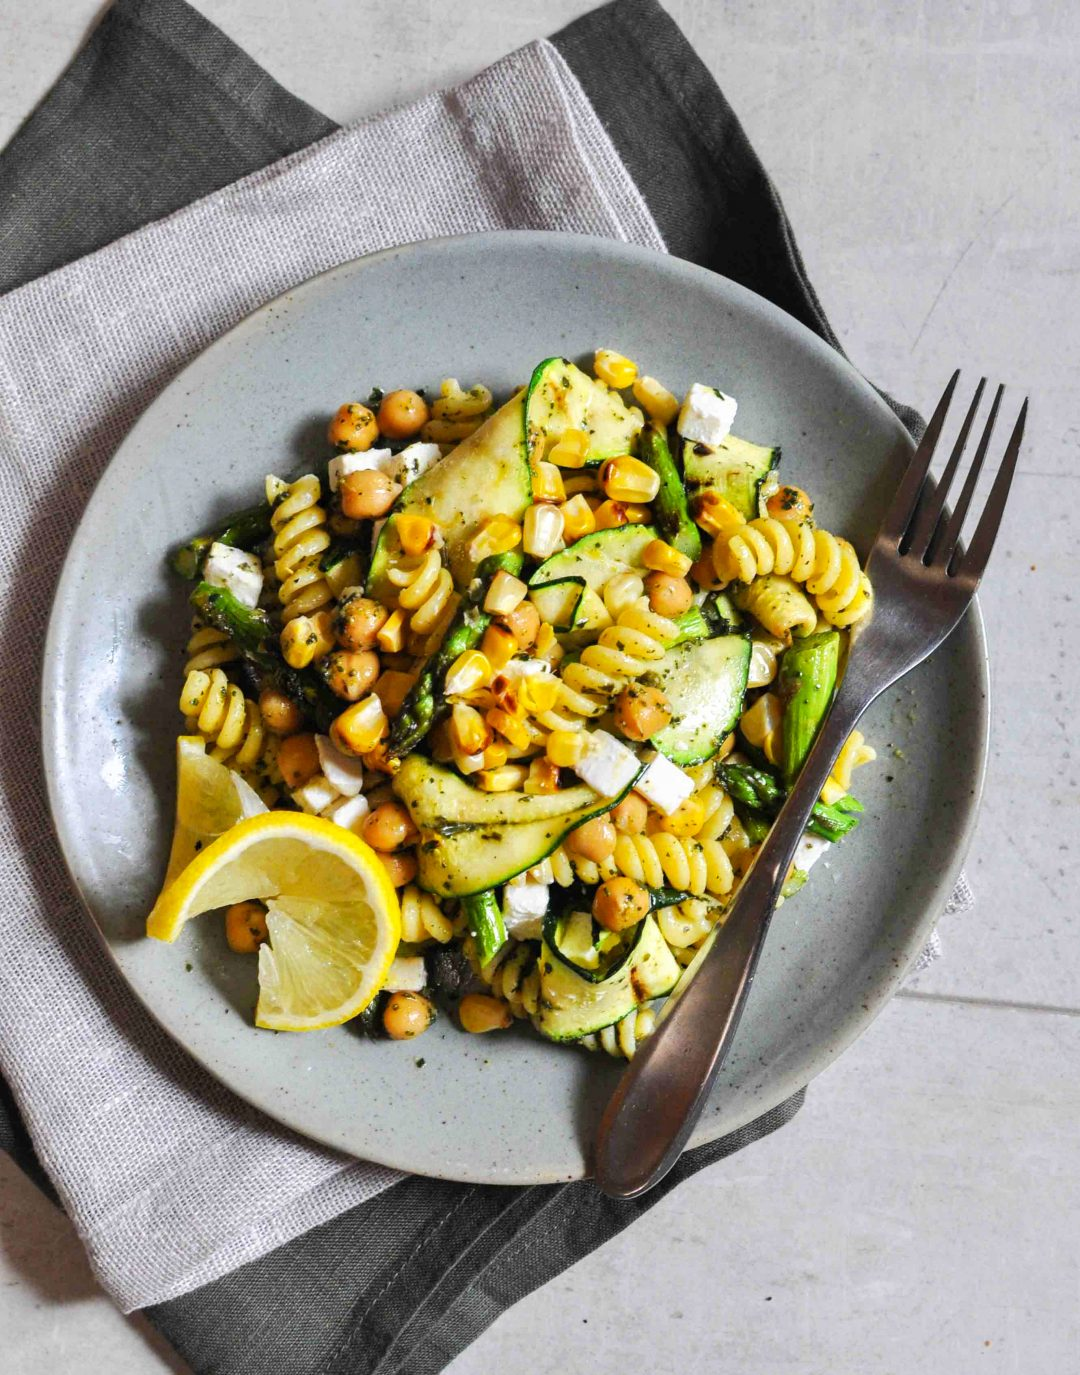 zucchini salad on plate